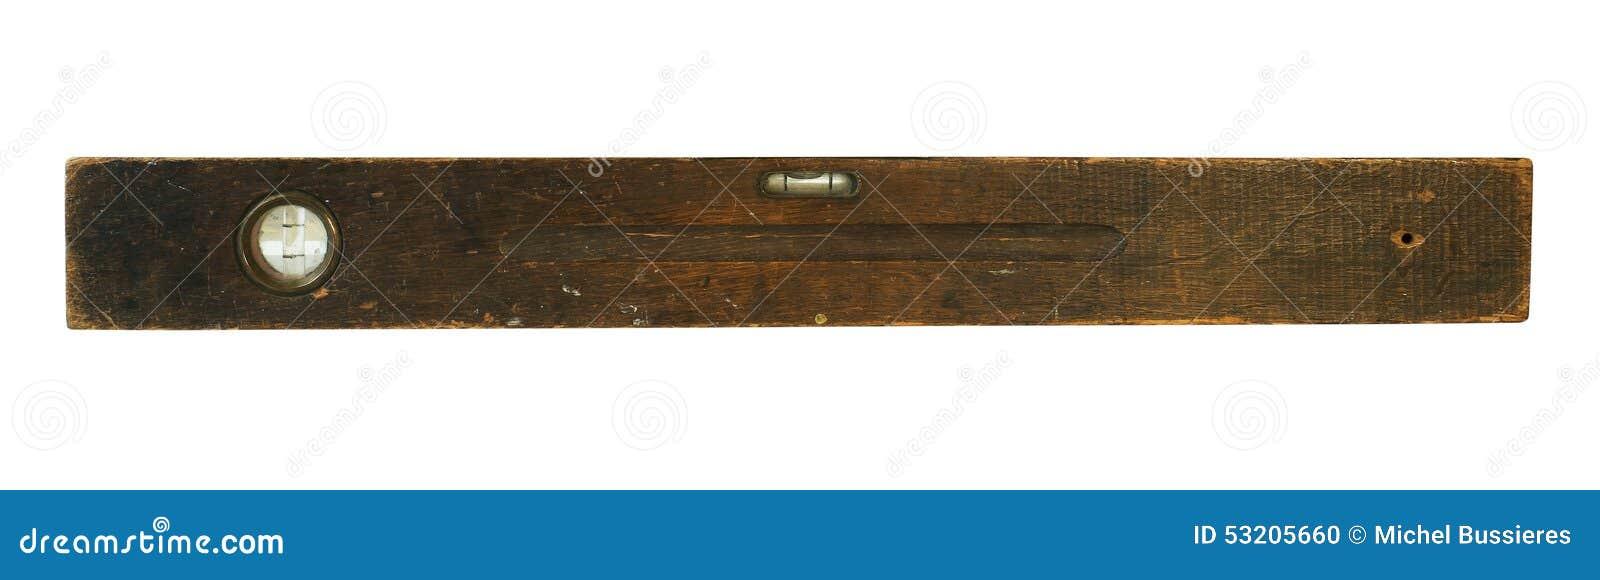 Old Vintage Wooden Level Stock Photo Image Of Handyman 53205660